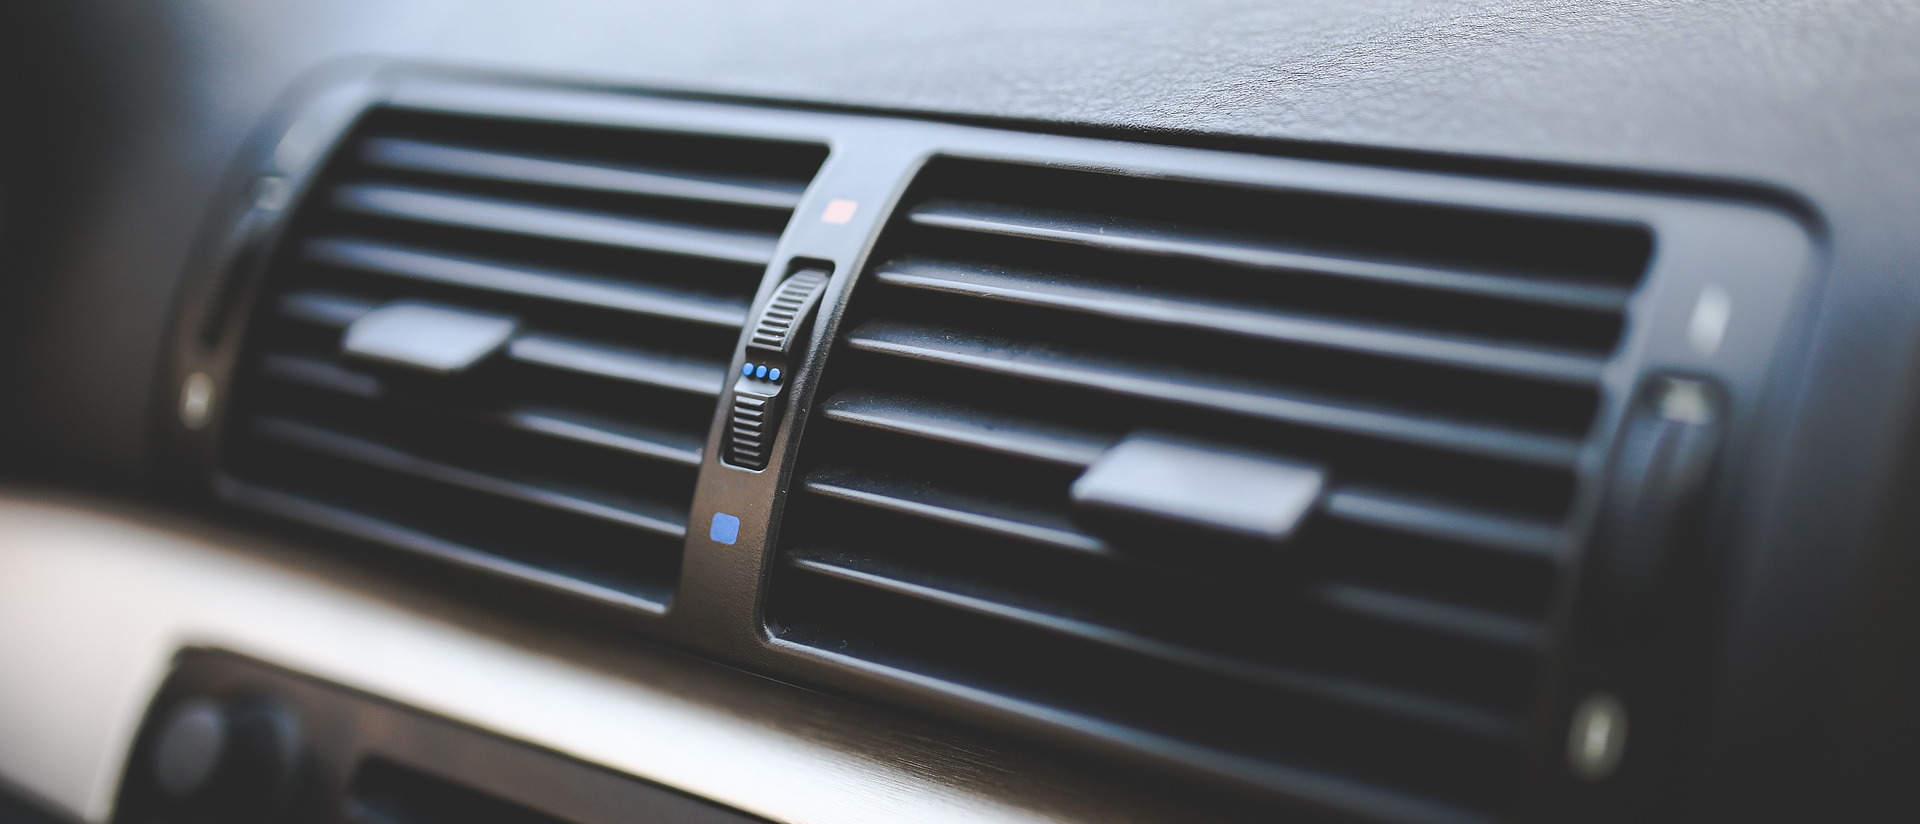 Motoopiekun - Prompcja klimatyzacji